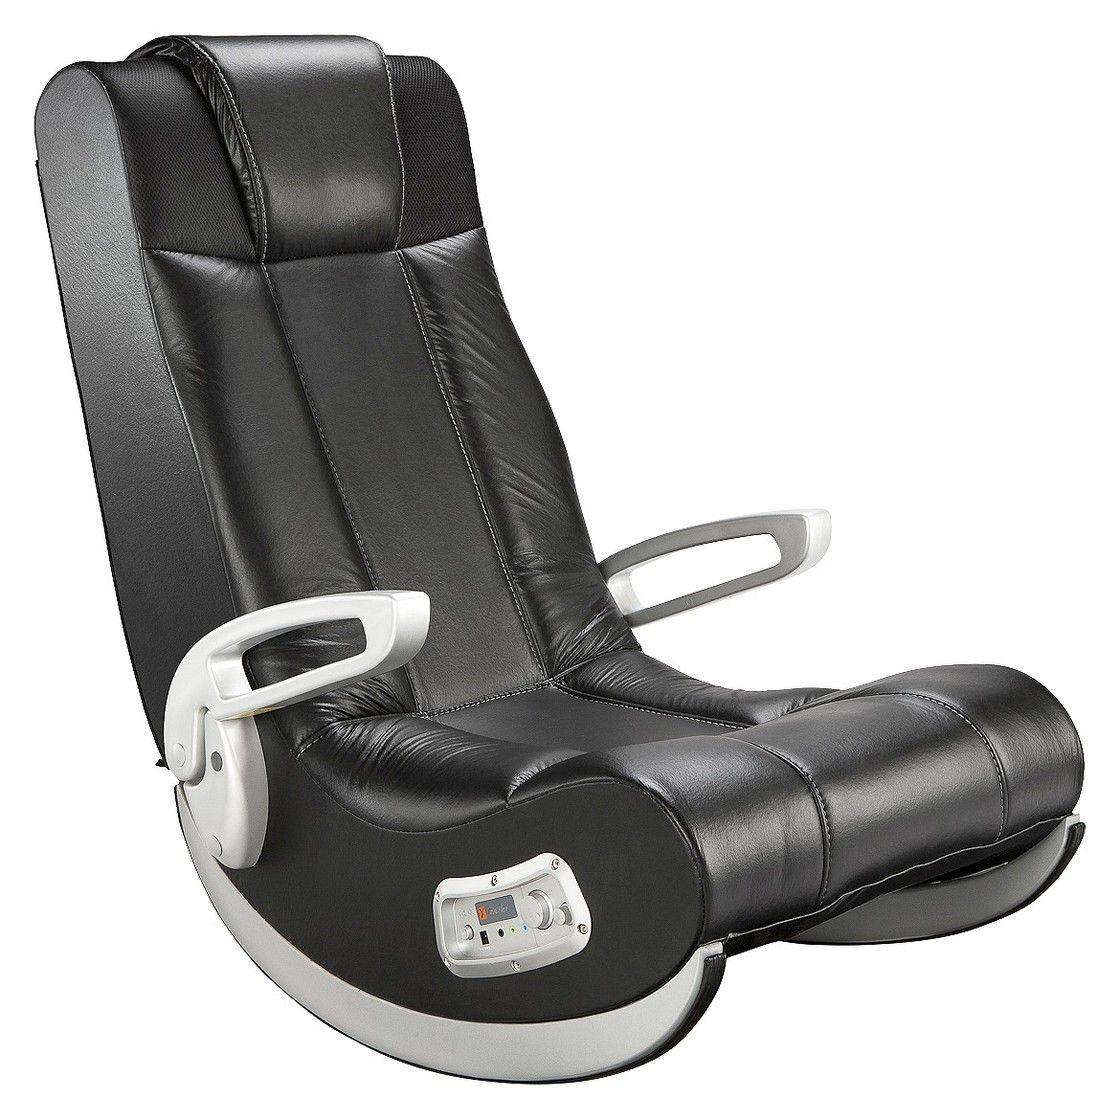 ACE BAYOU XRocker Gaming Chair Black Gaming chair, Chair